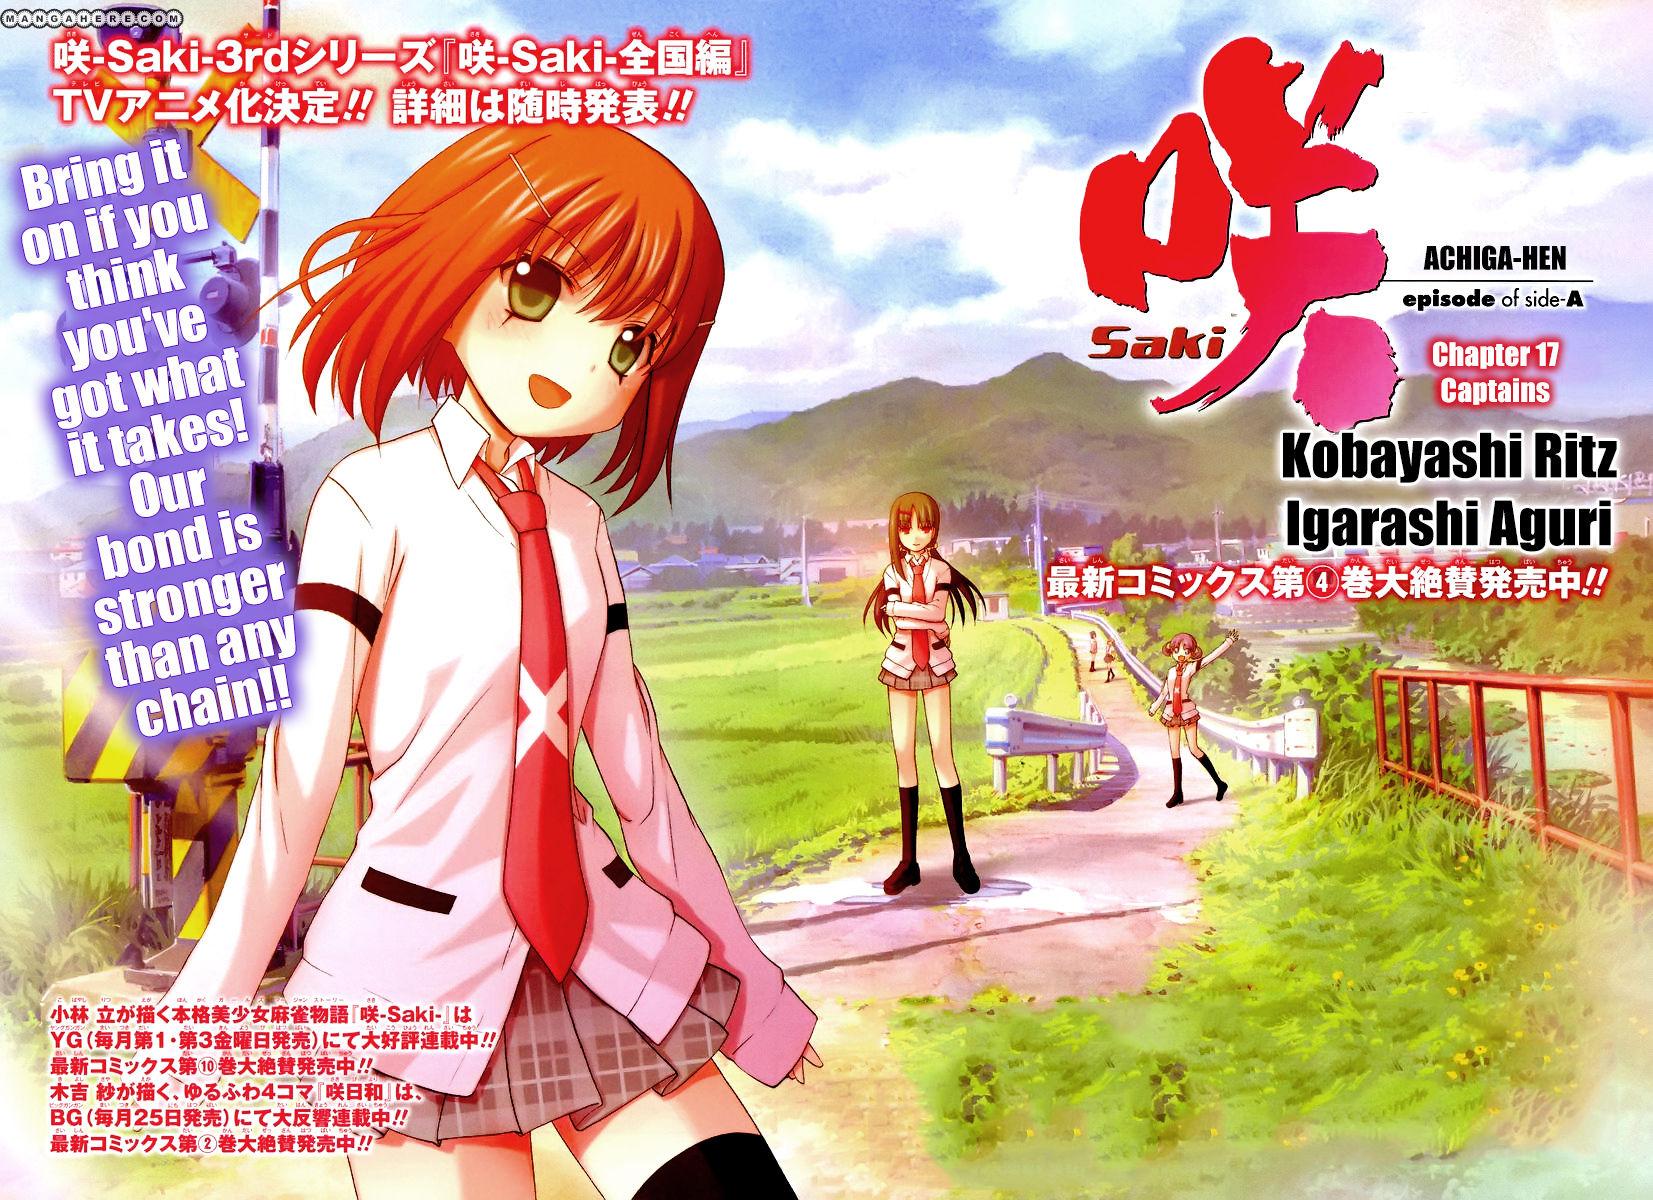 Saki Achiga Hen Episode Of Side A 17 Page 2